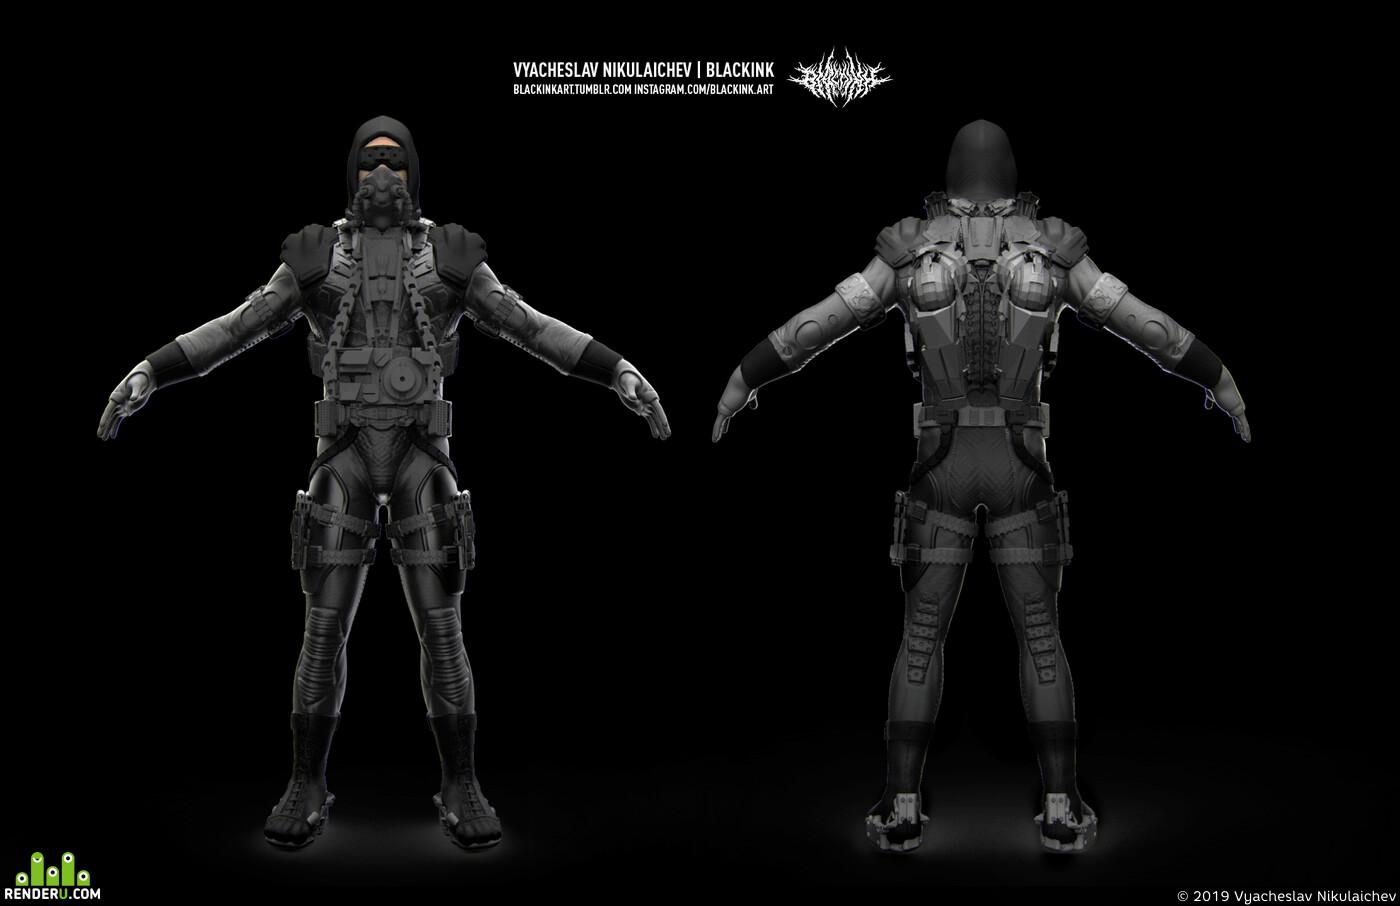 sci-fi, scifi, sci-fi armor, character, design_character, sculpting, digital sculpture, zbrushsculpt, 3d sculpt